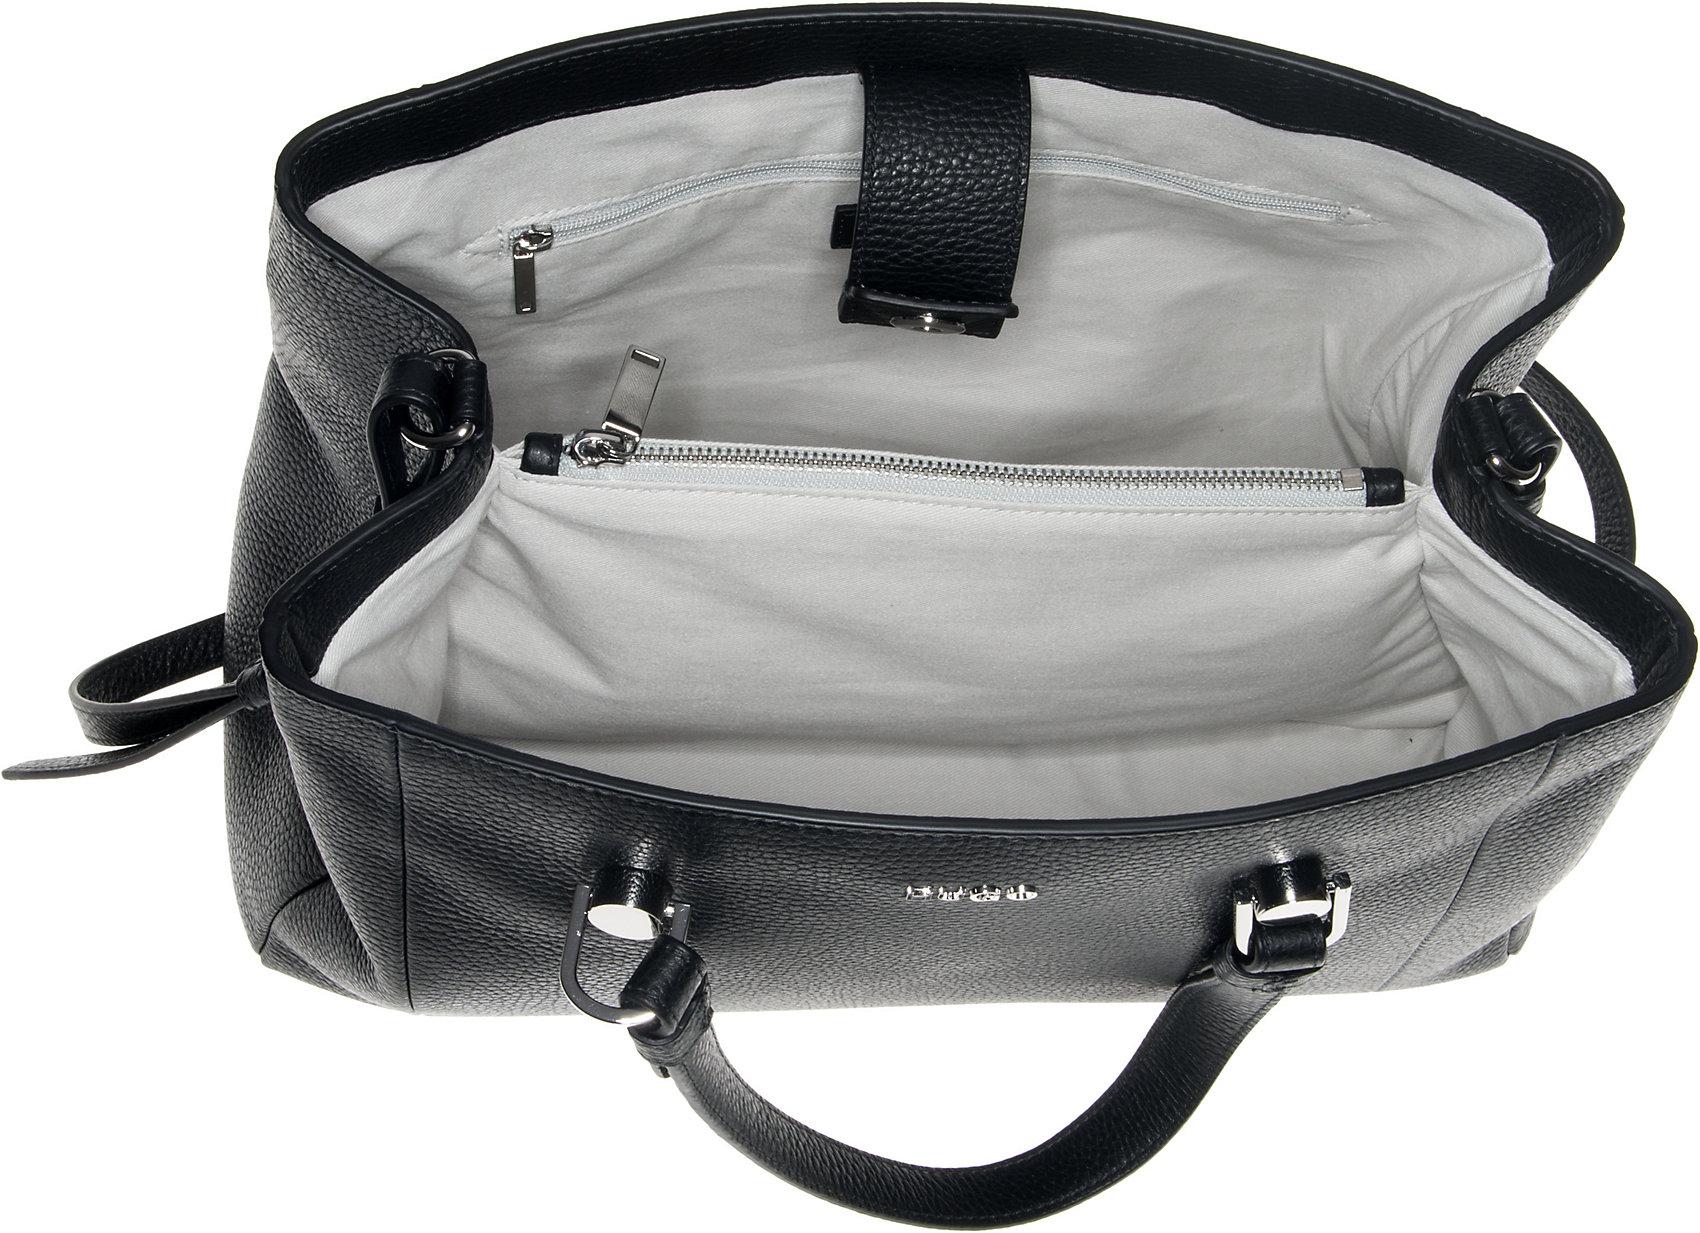 Neu Hugo Boss Model Model Model  Mayfair  Handtasche 10235263 für Damen | Grüne, neue Technologie  | Exquisite Handwerkskunst  | Bunt,  f8ecc2